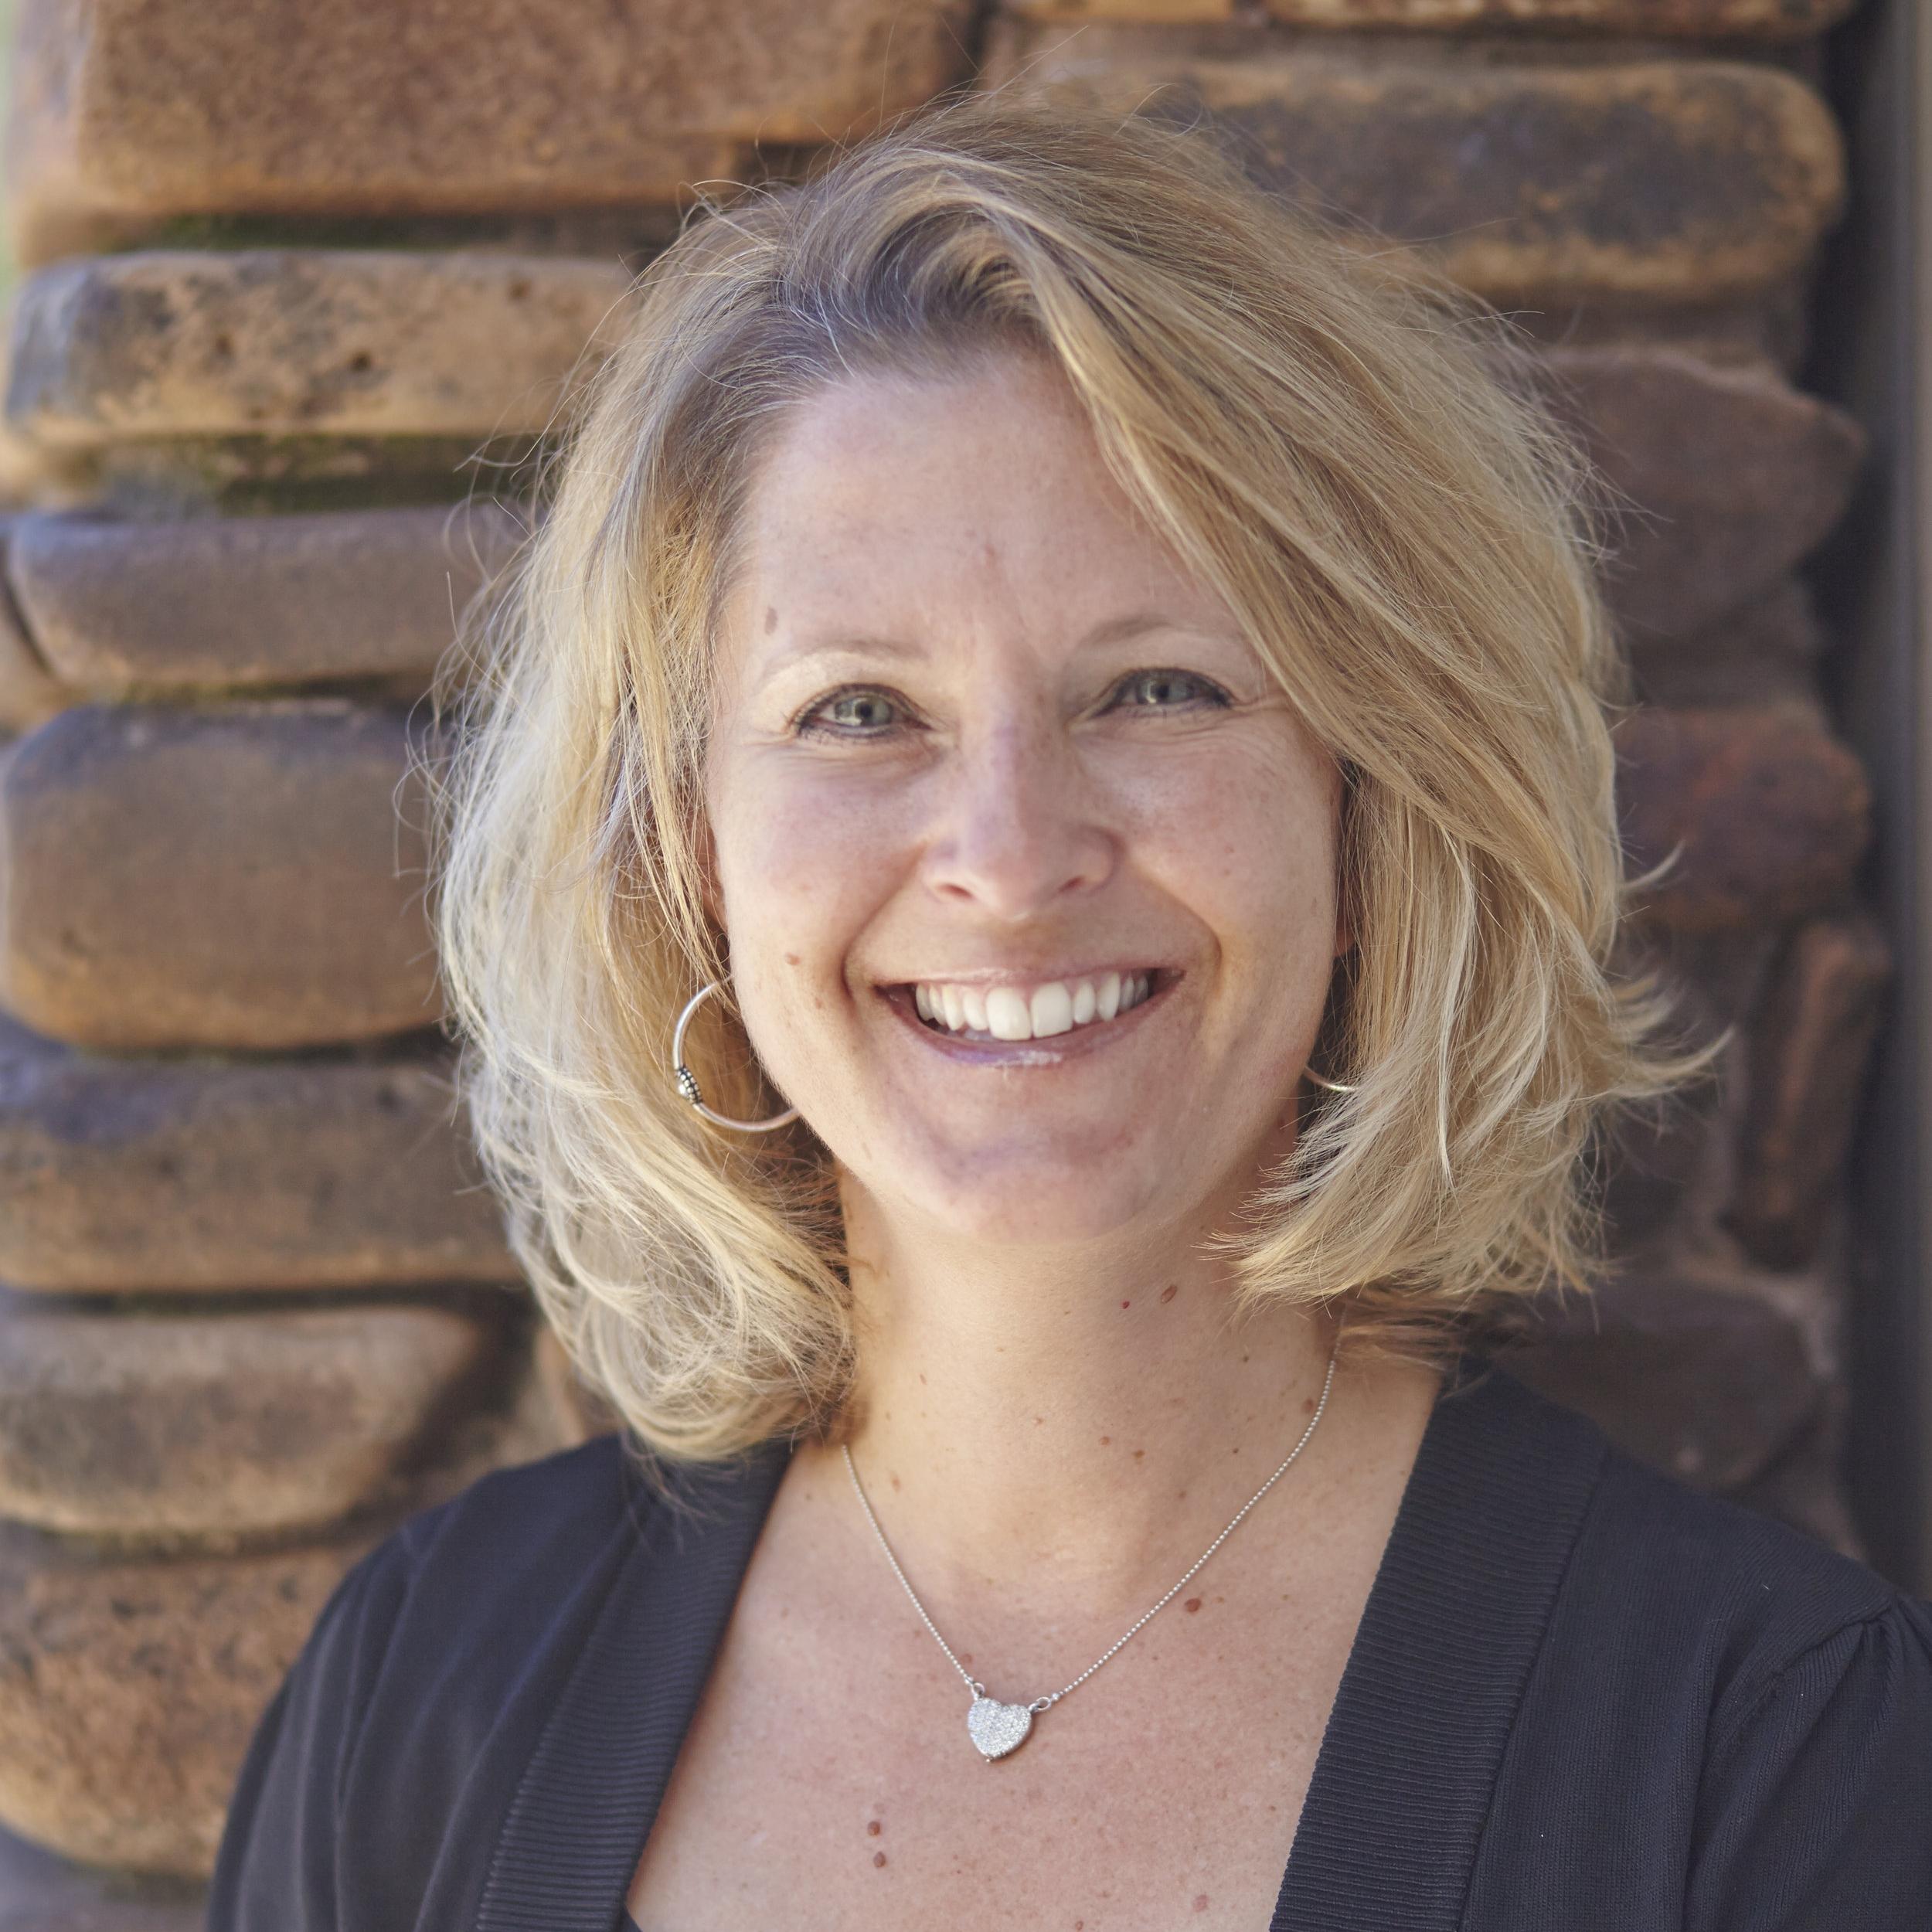 Renee Robinson - Head of Design